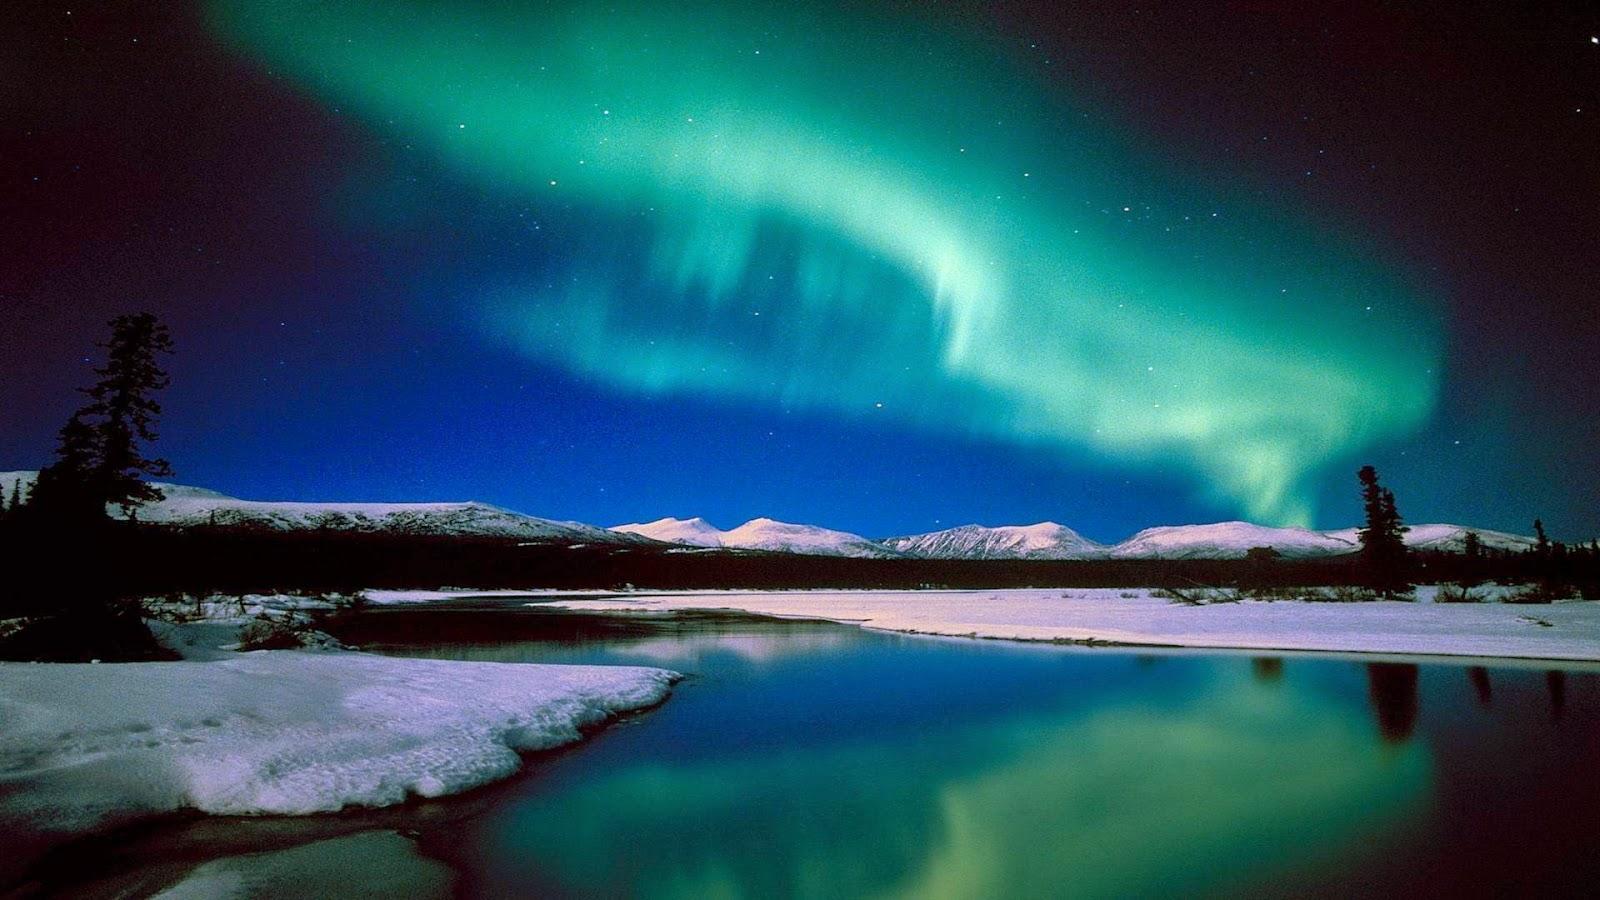 20 Amazing Colorful Aurora Borealis Wallpapers HD -o-   1 Wallpaper Picture Photo